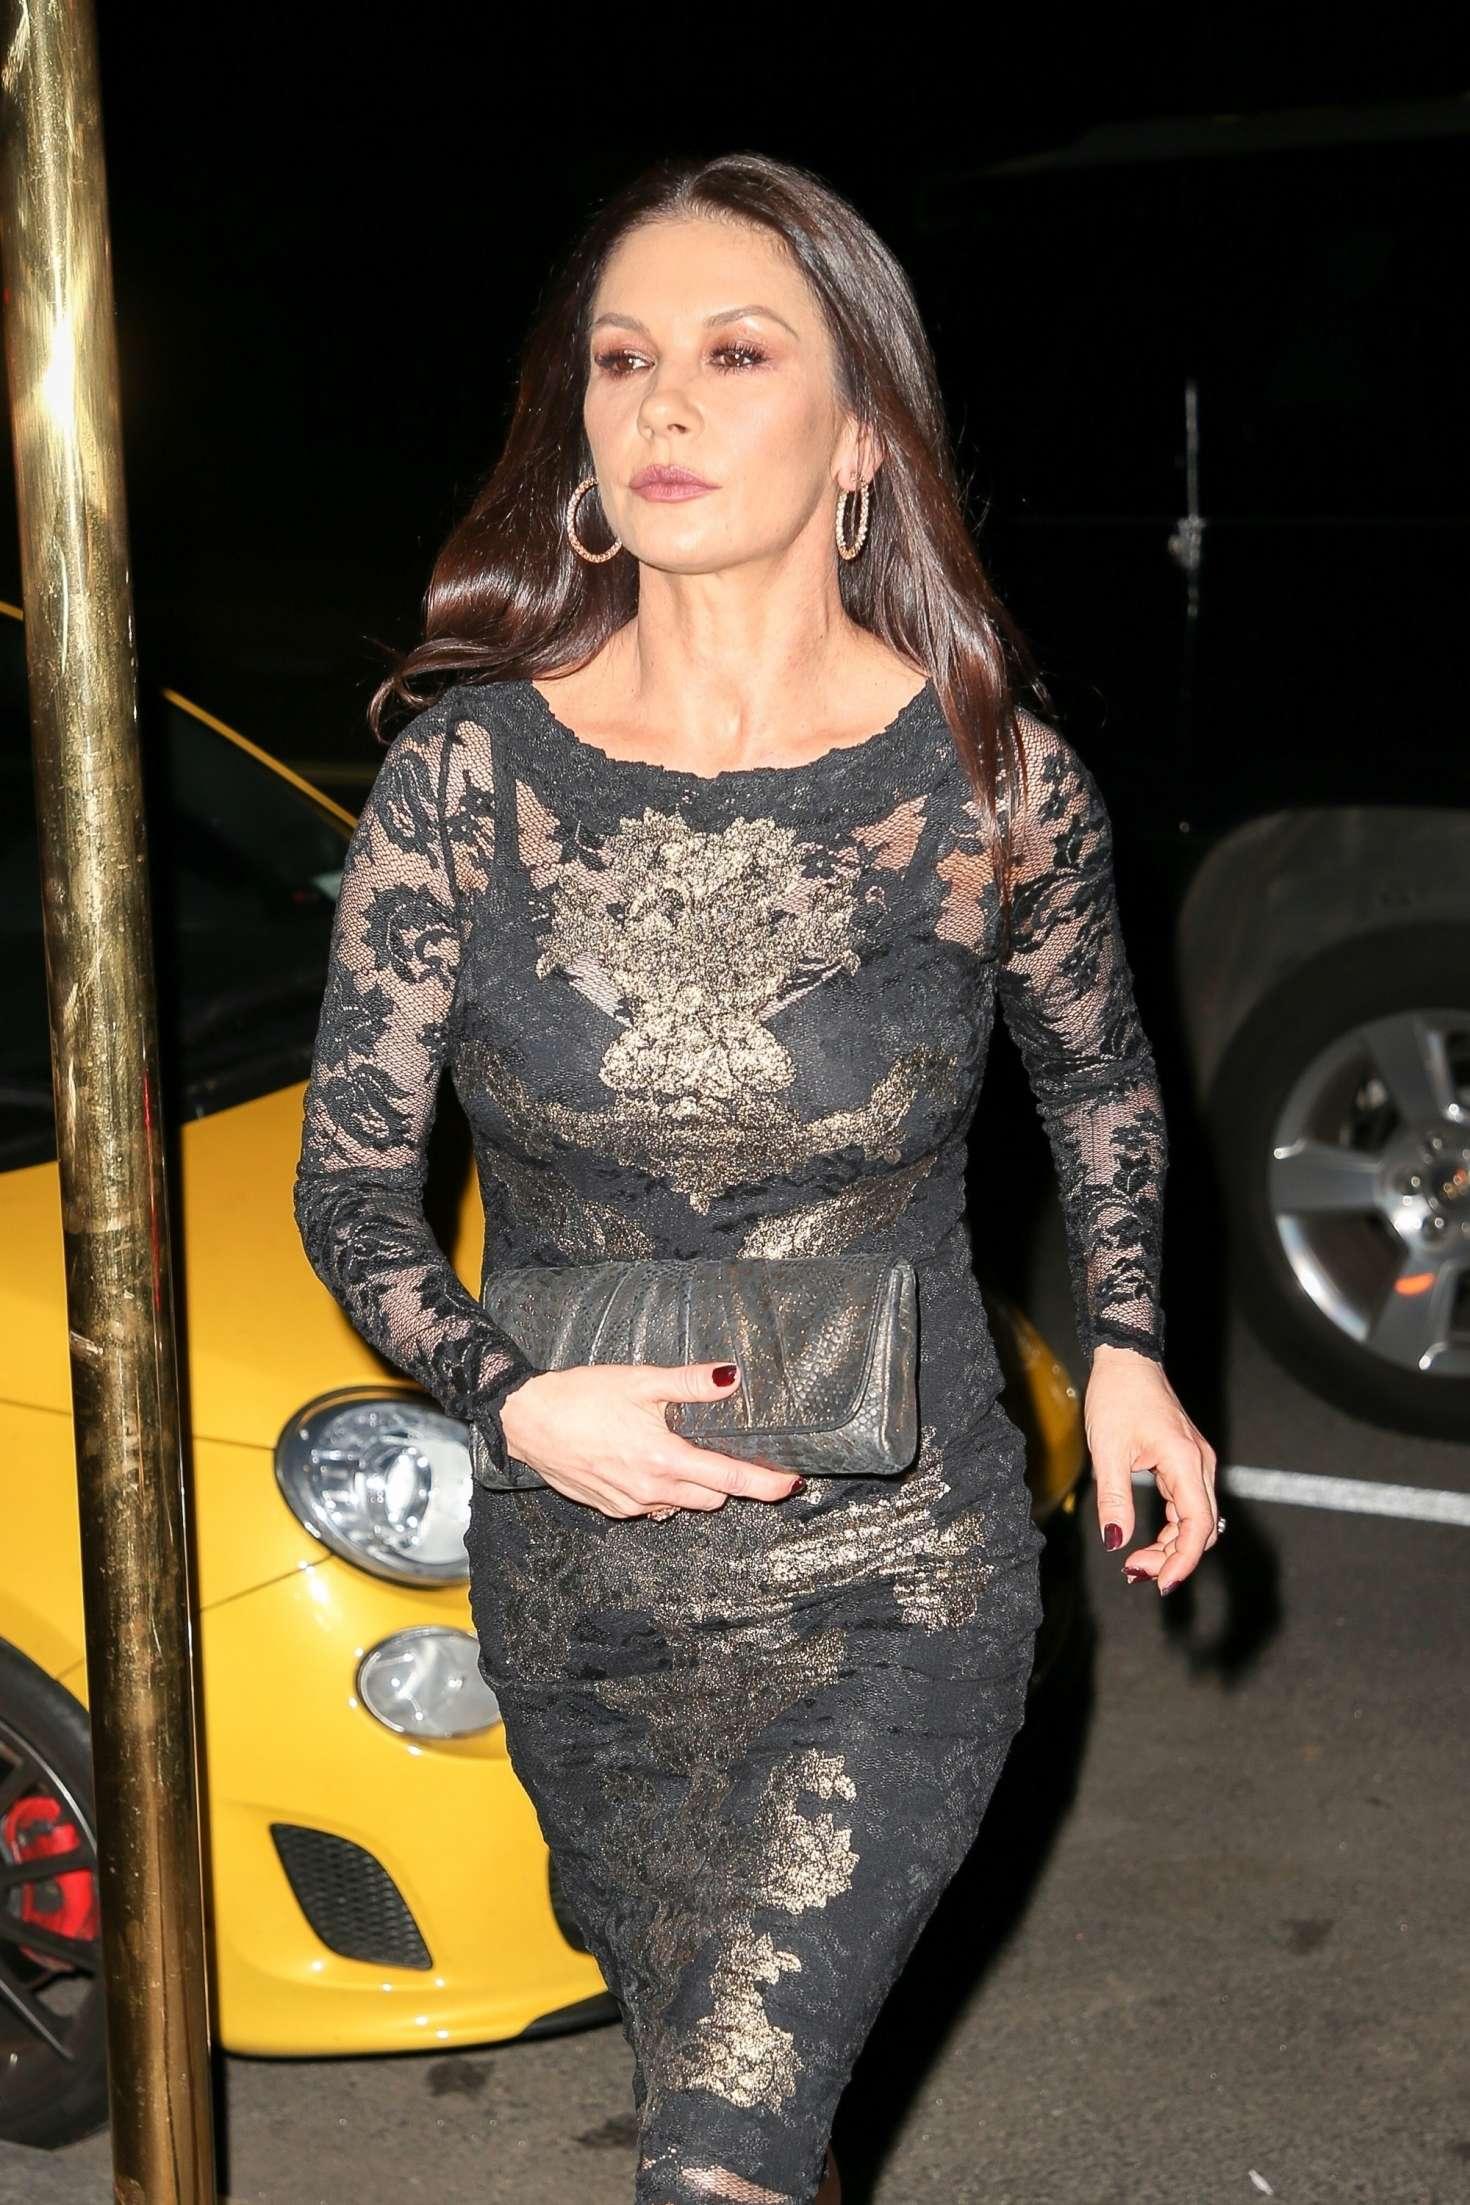 Catherine Zeta Jones - Arriving back at her apartment in New York